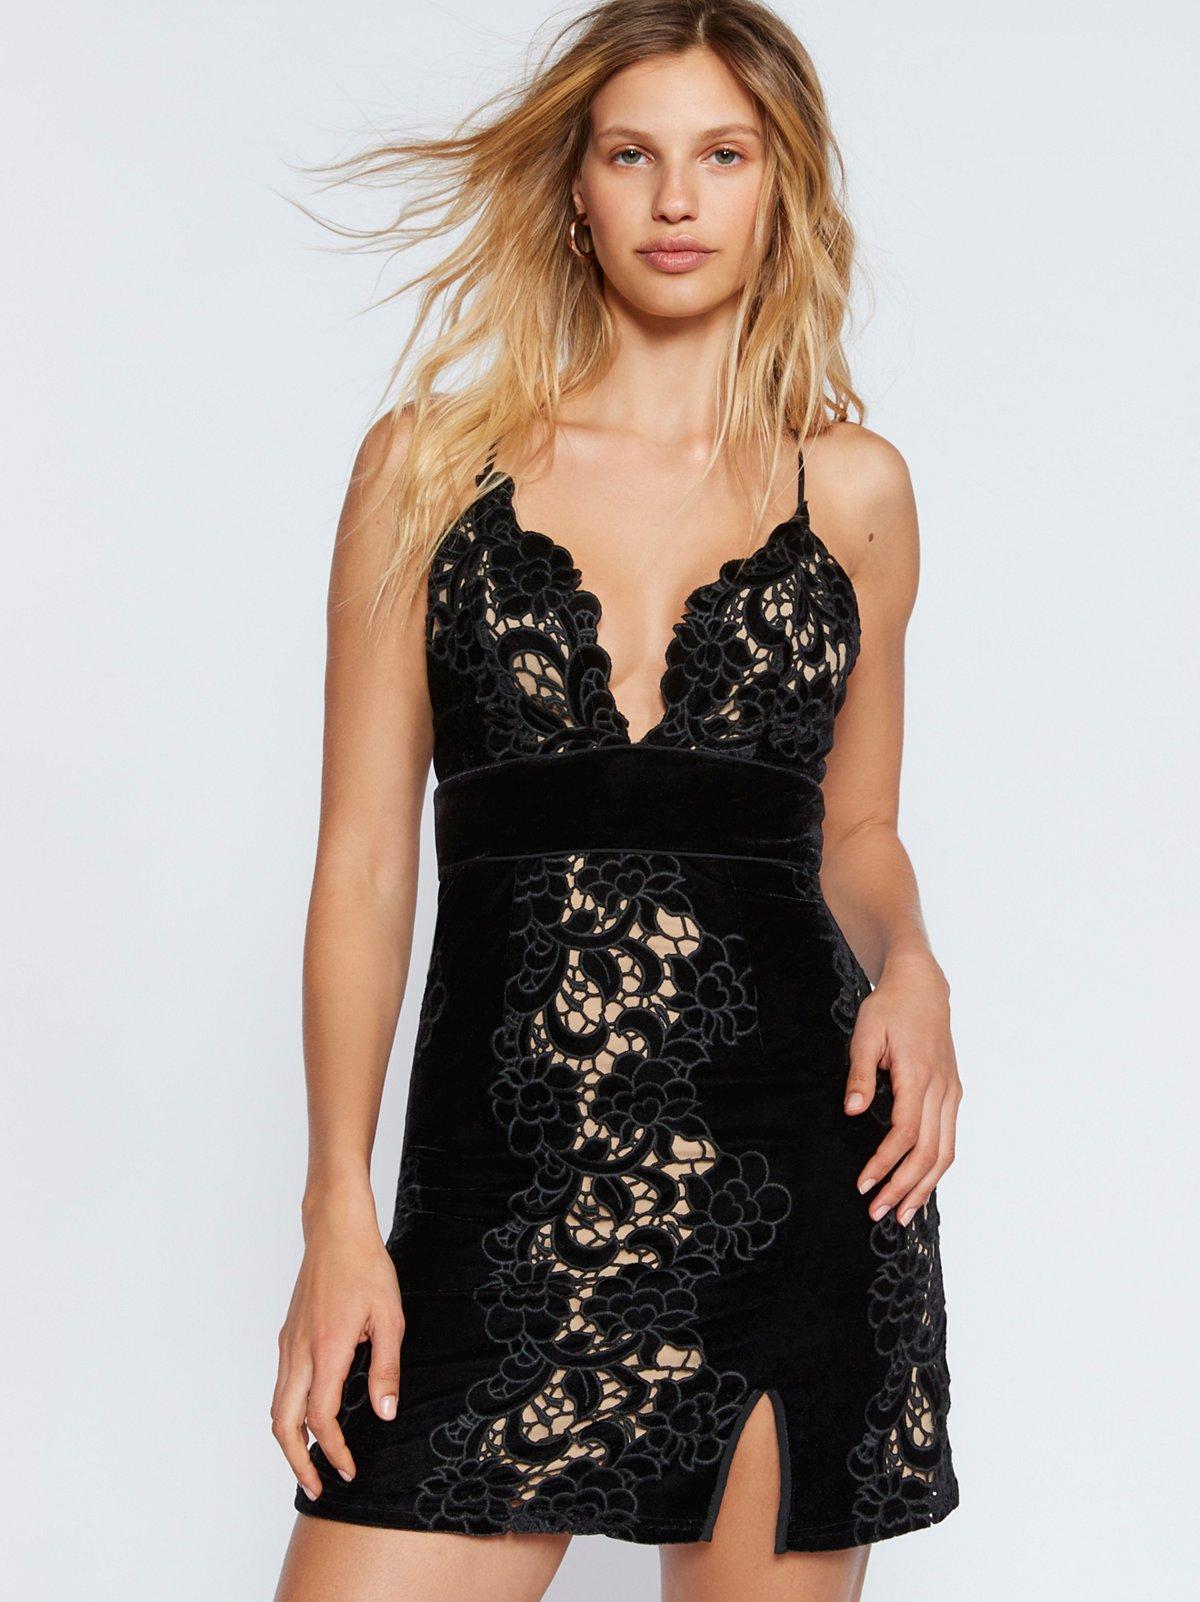 Saylor Logan Mini Dress at Free People Clothing Boutique